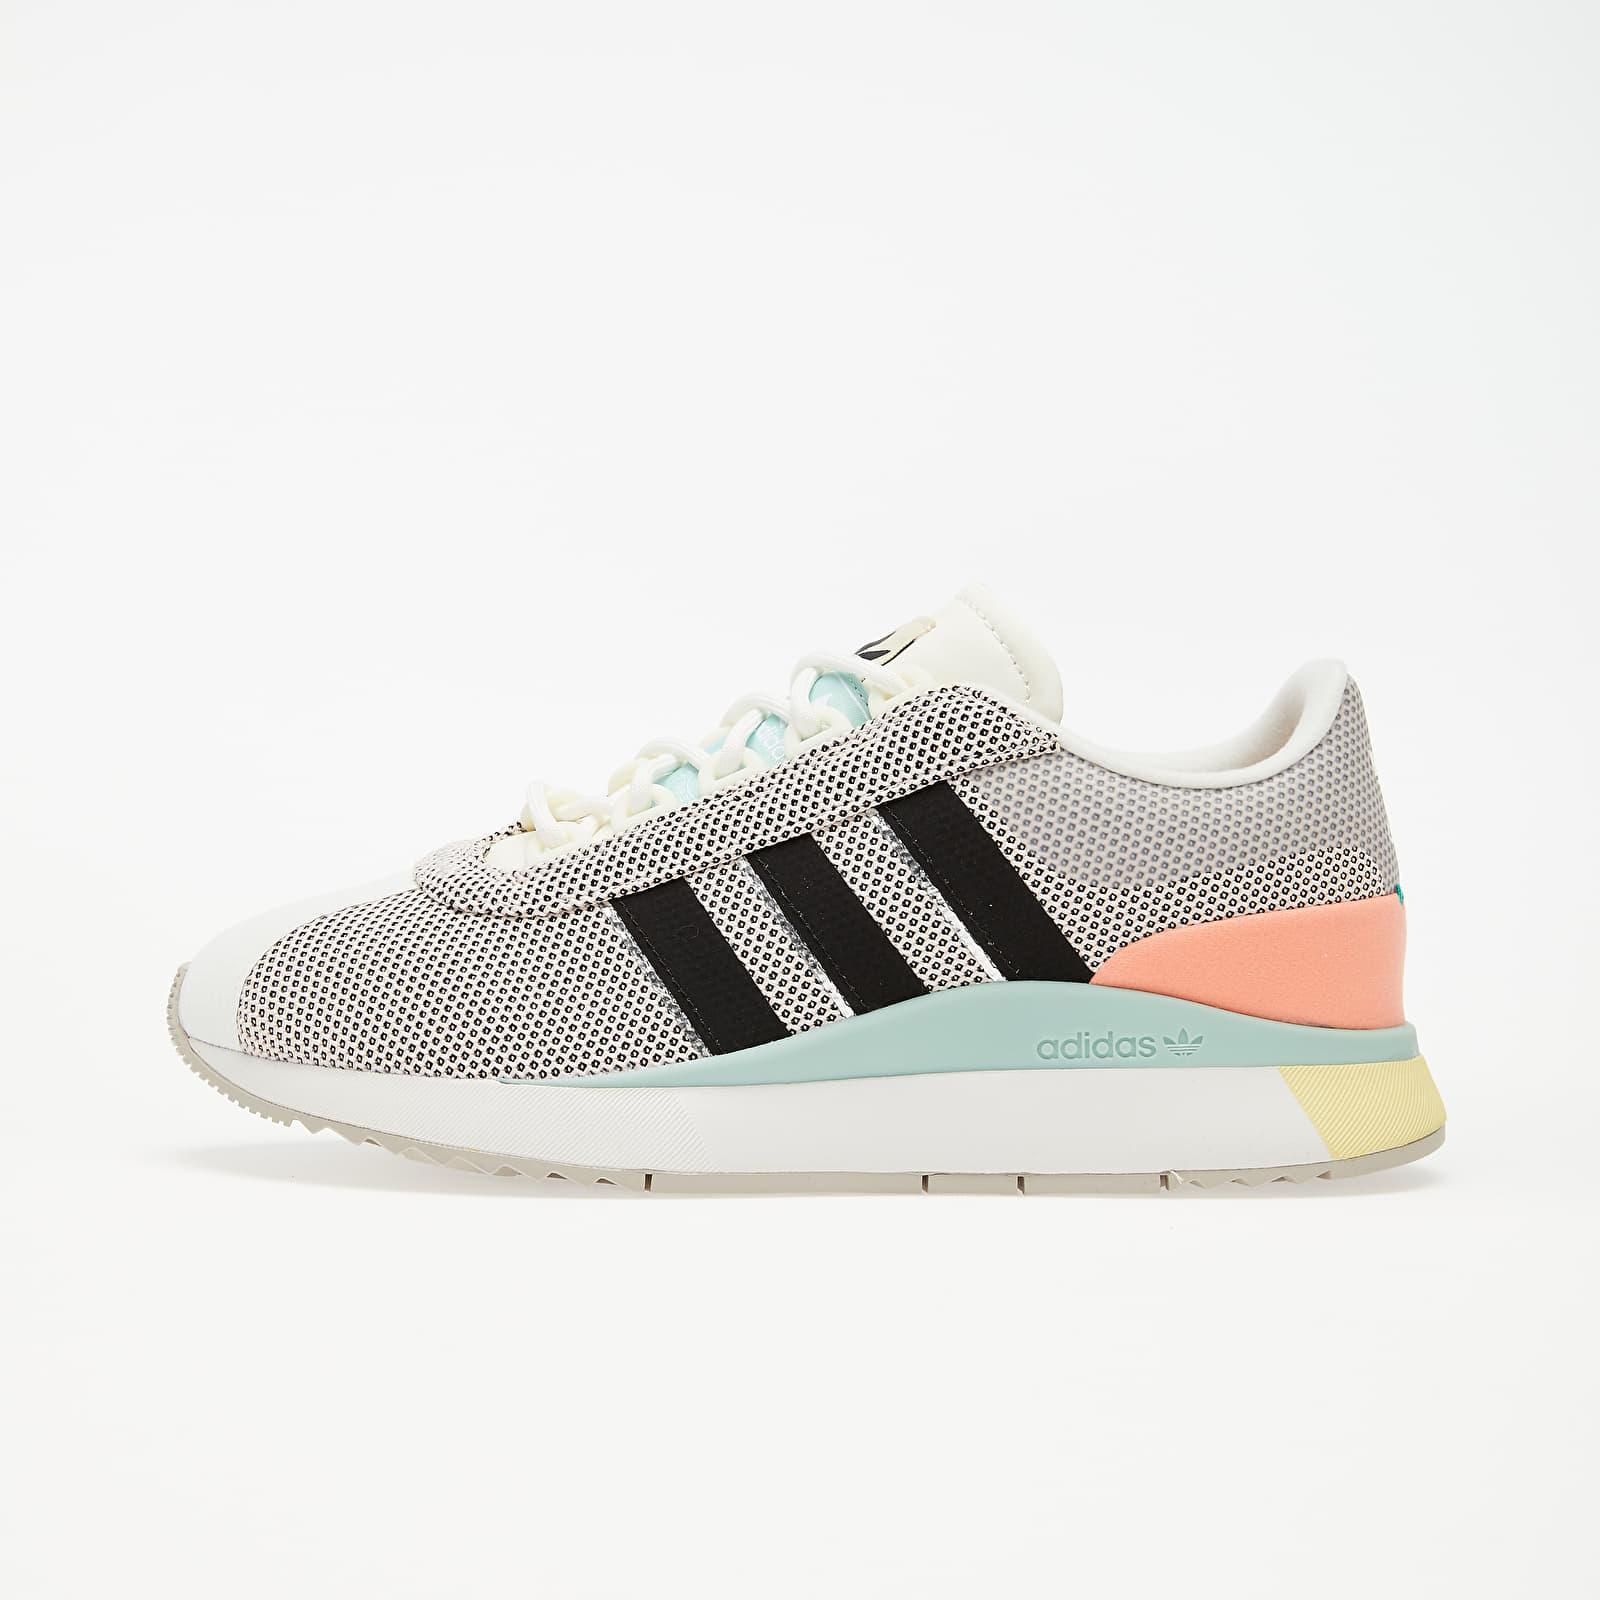 Dámské tenisky a boty adidas SL Andridge W Cloud White/ Core Black/ Chalk Coral